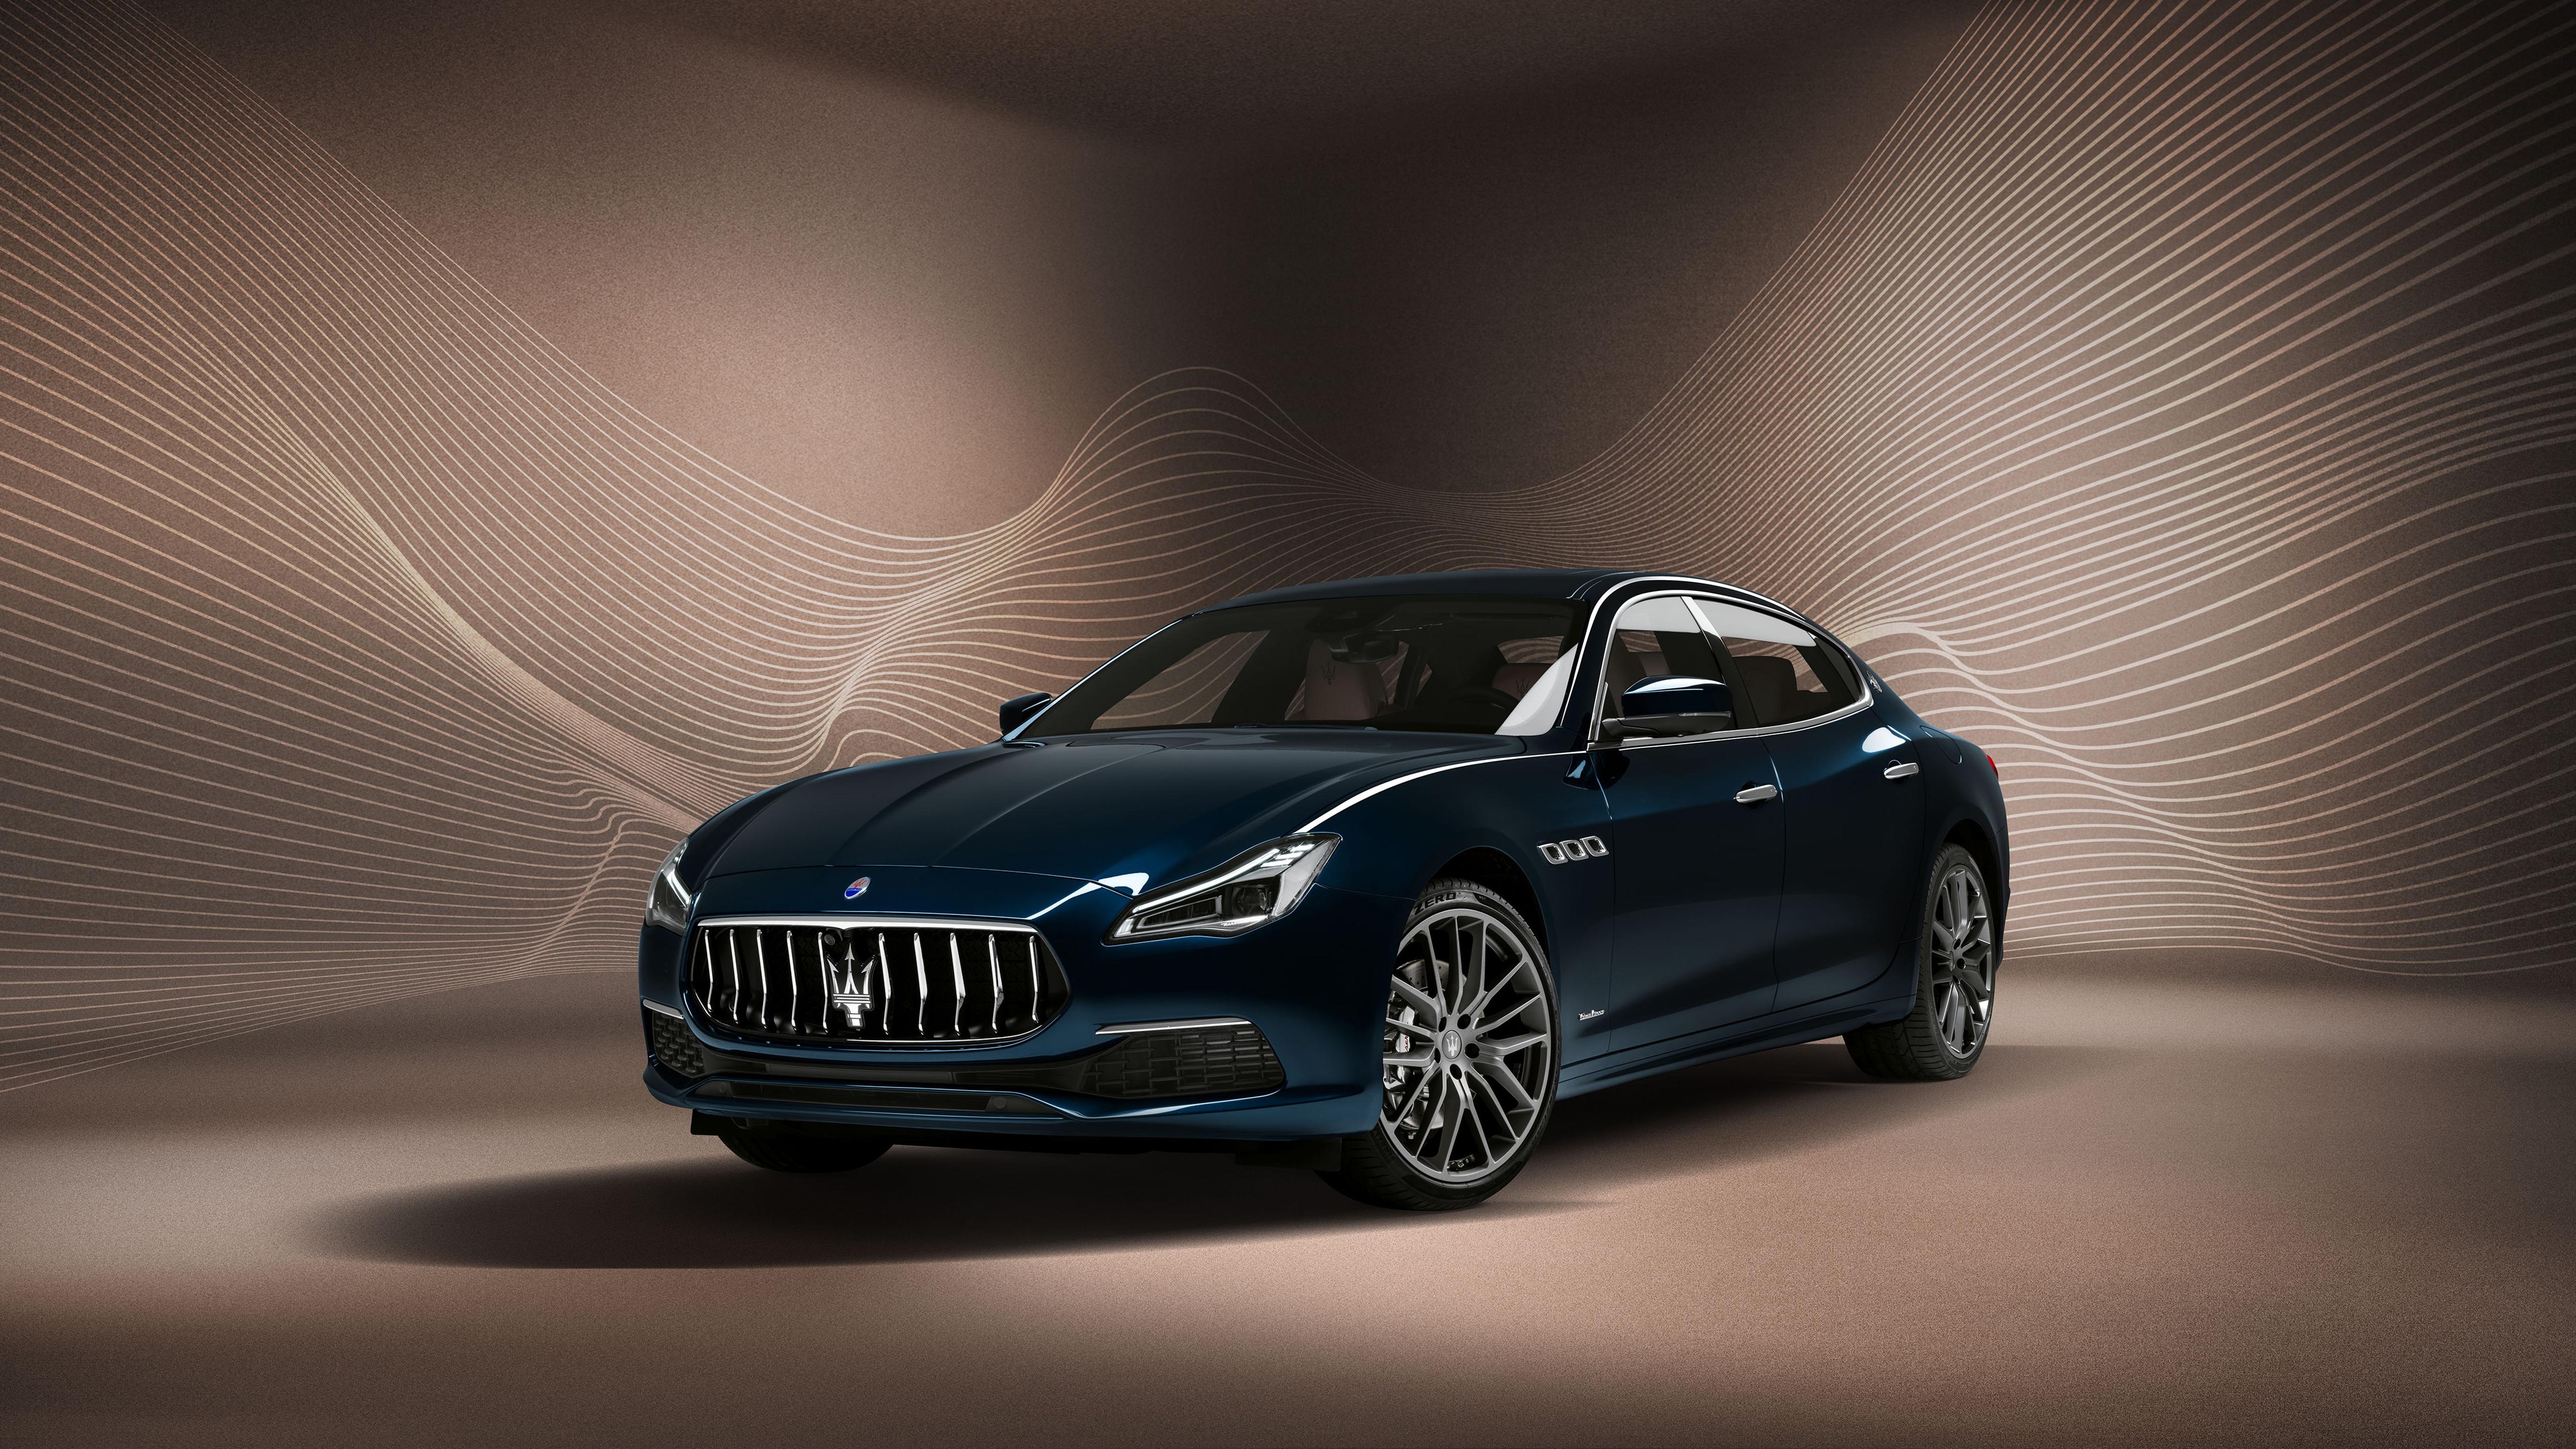 Maserati Quattroporte GranLusso Royale 2020 5K Wallpaper HD Car 5120x2880